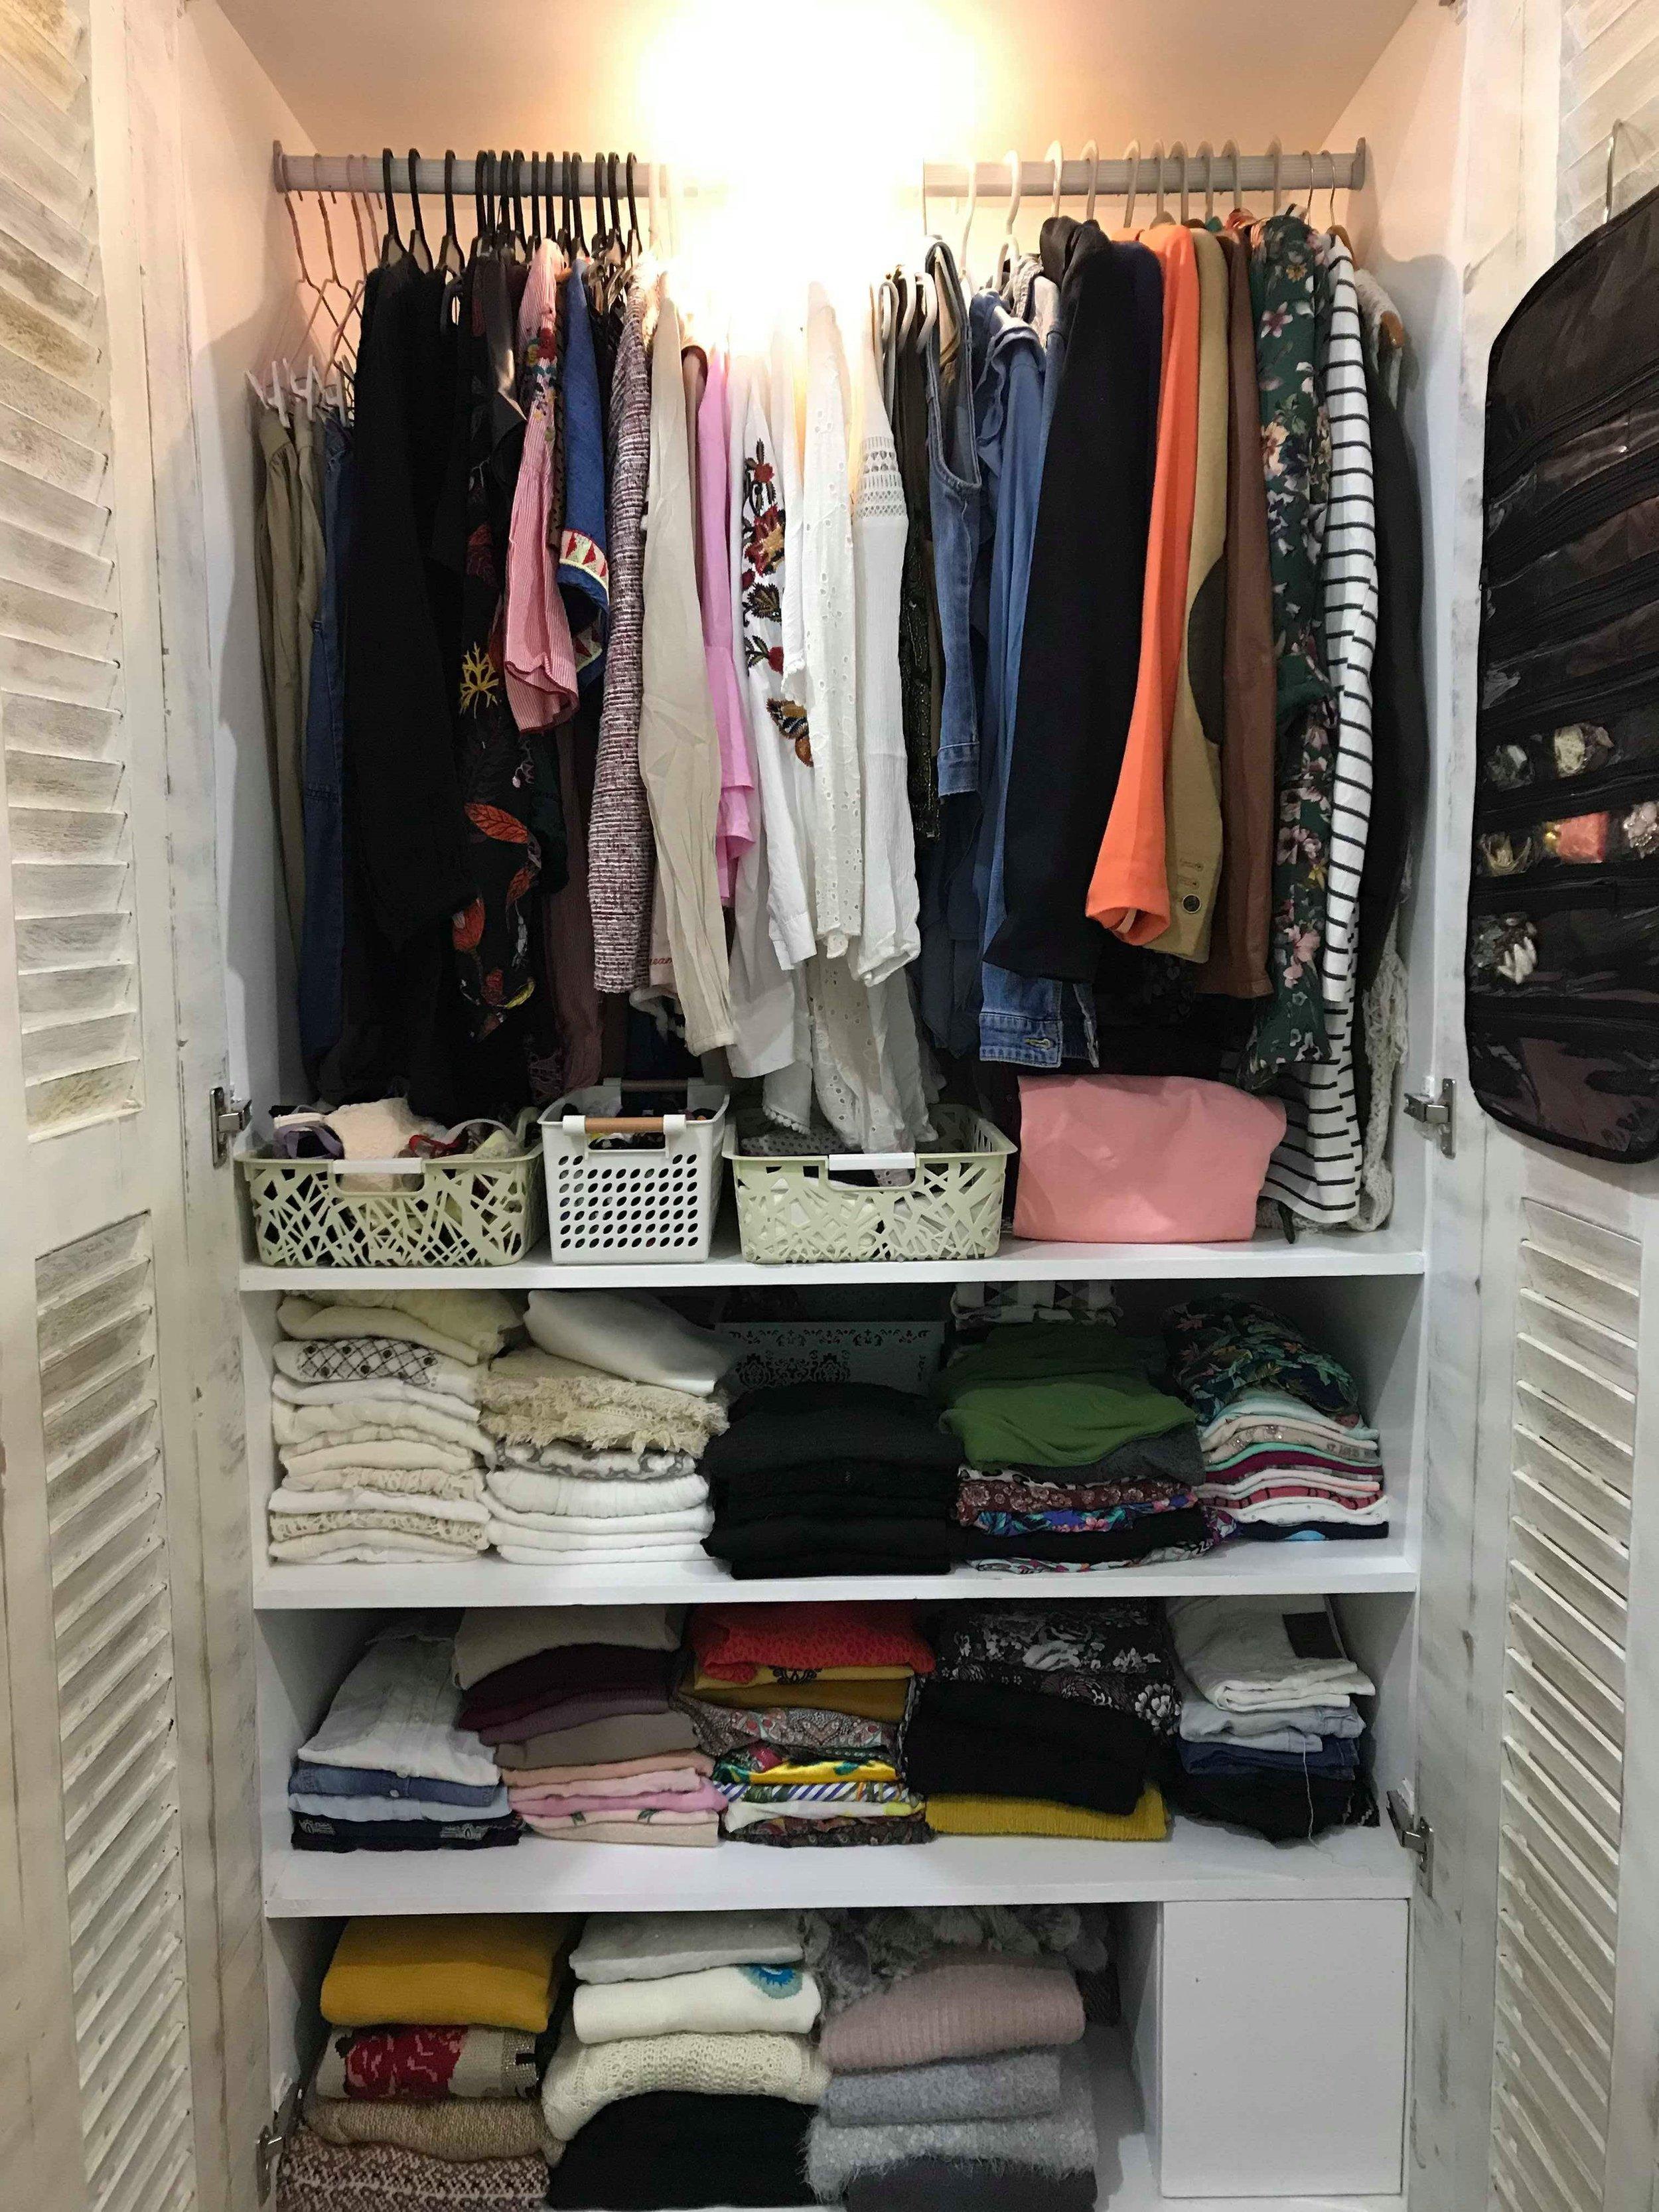 After_closet_full.jpeg